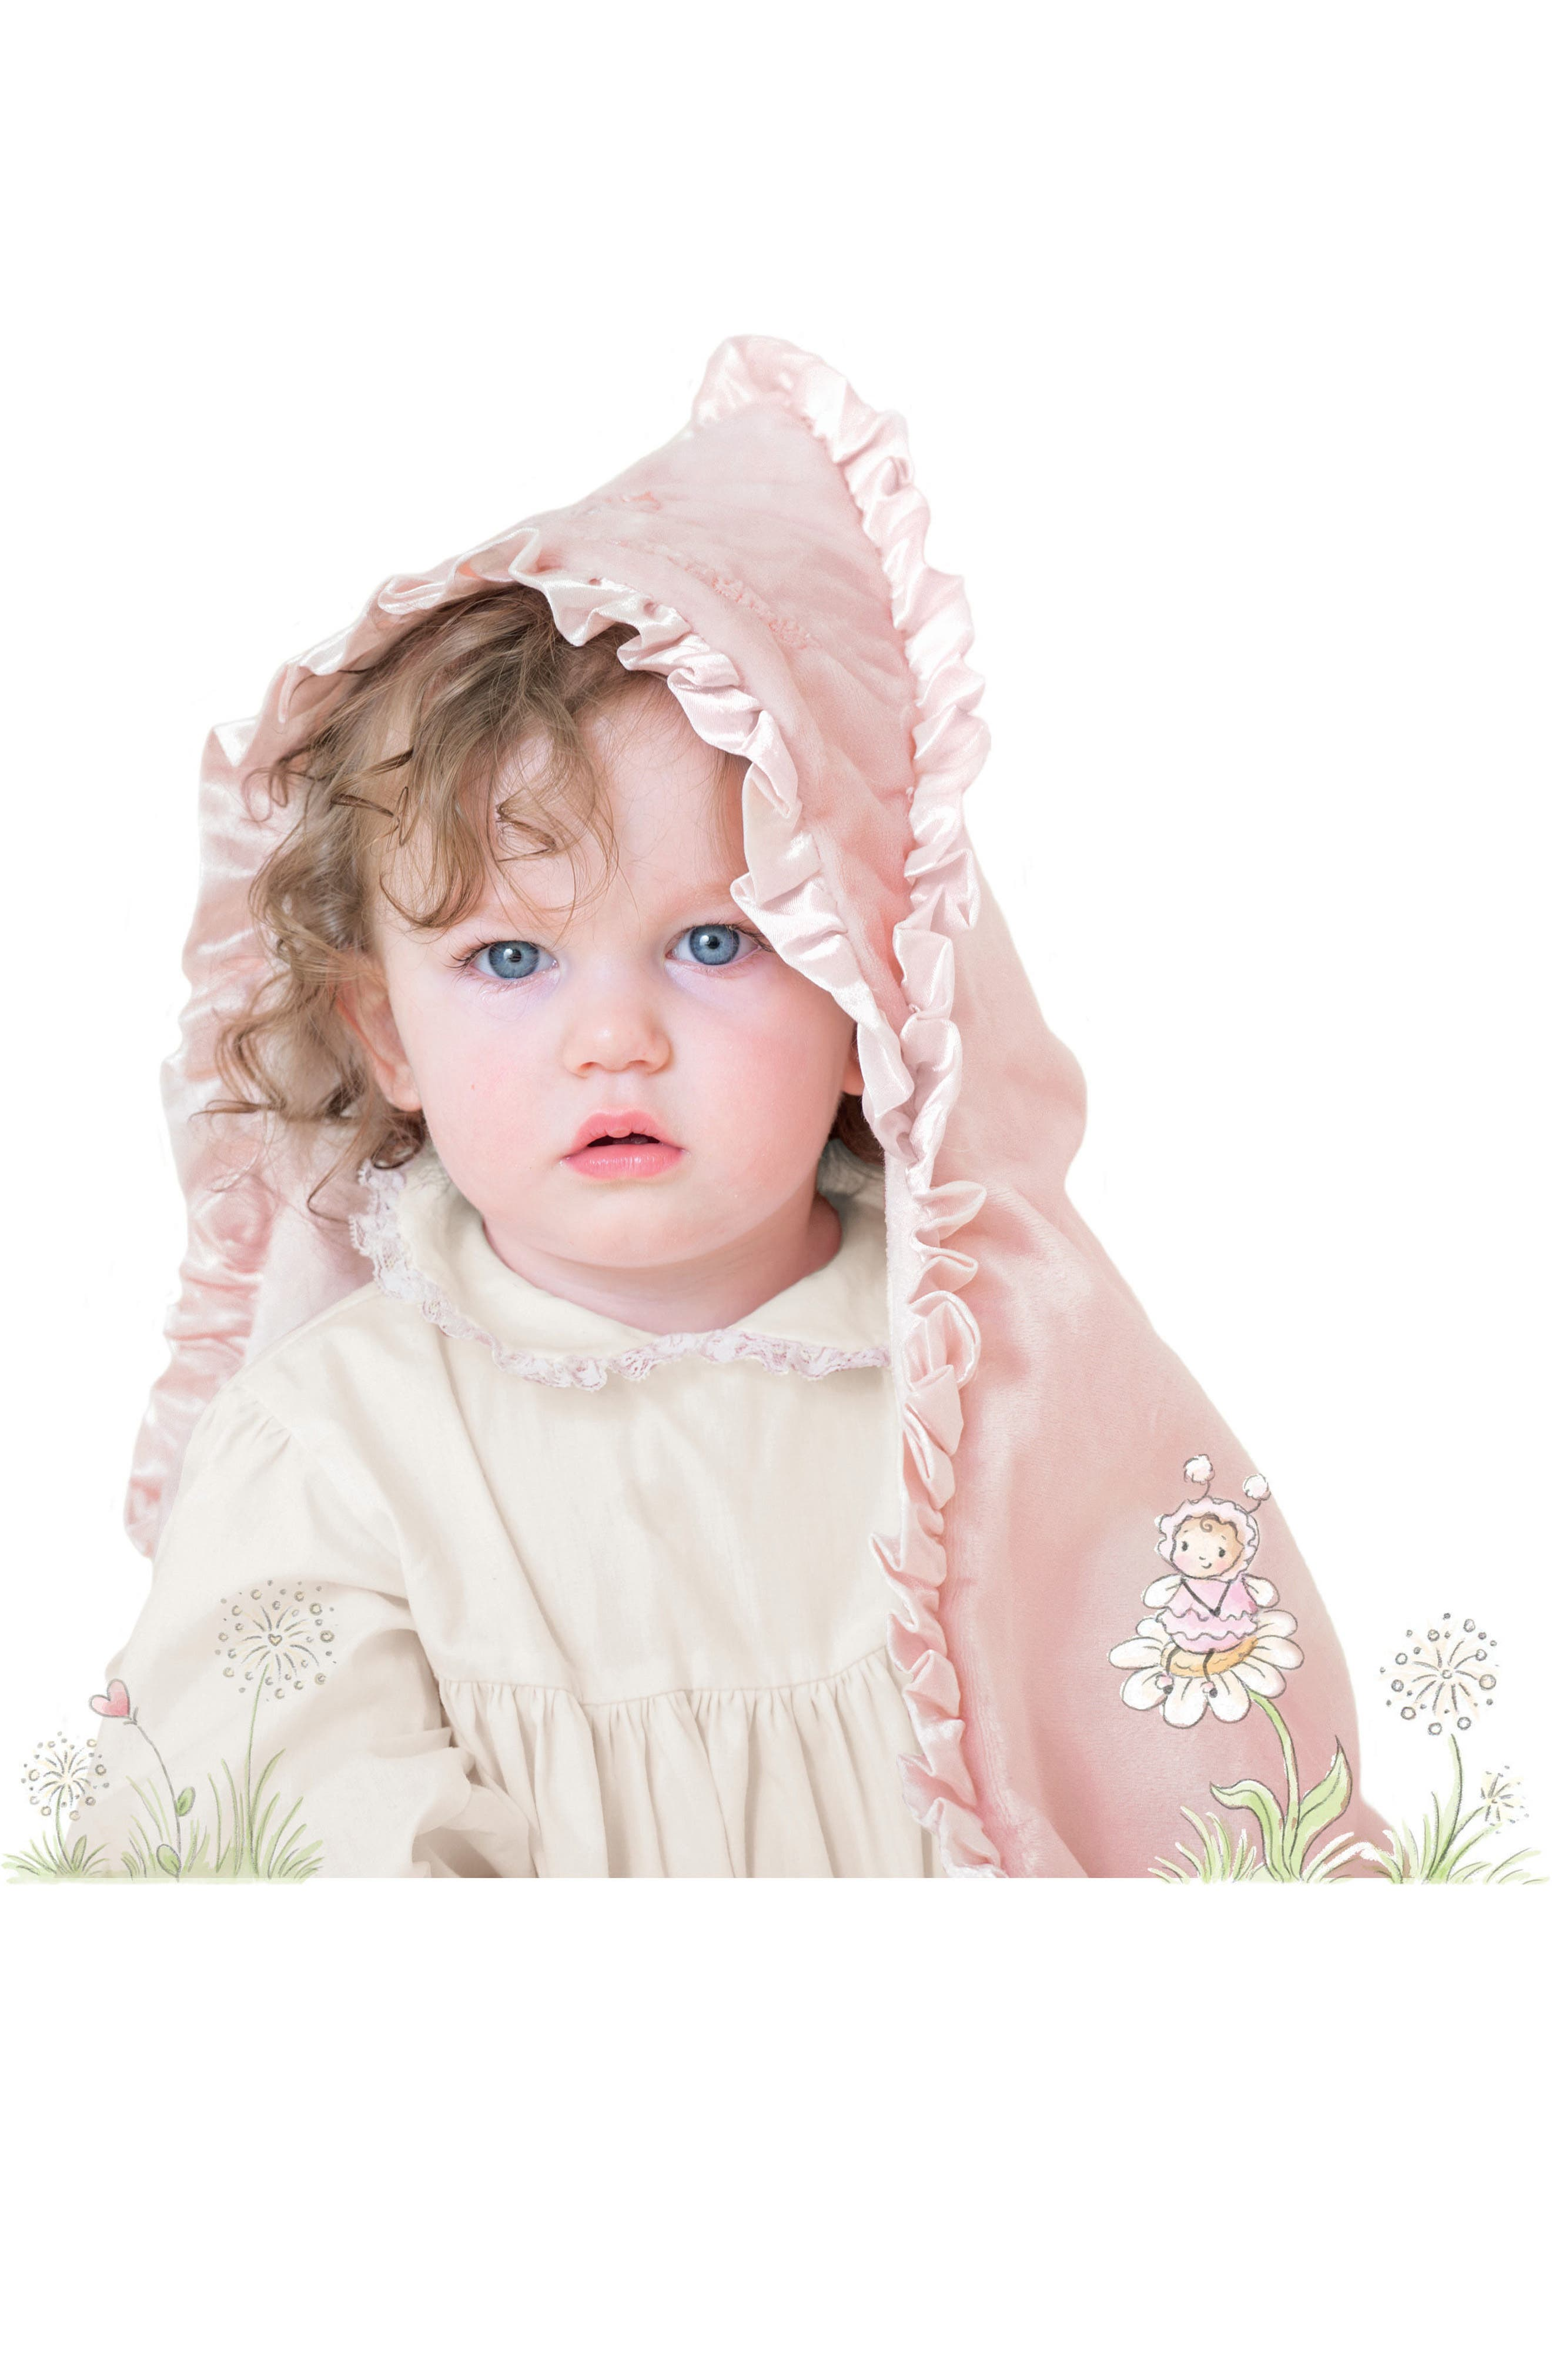 Little Curl Hooded Blanket,                             Alternate thumbnail 3, color,                             680